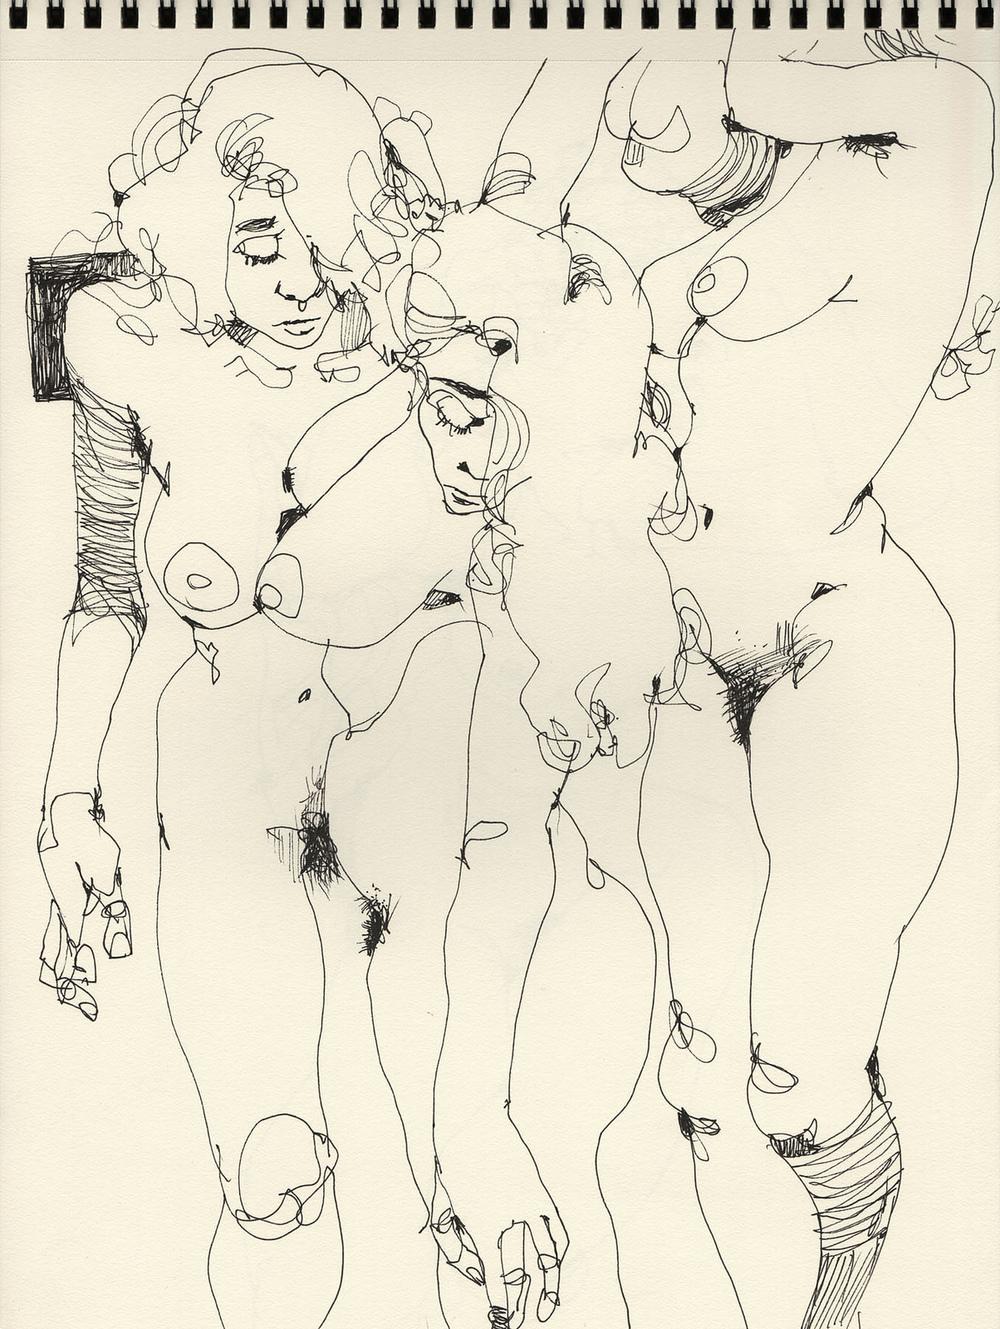 the-tree-mag-drawings-by-lu-cong-150.jpg